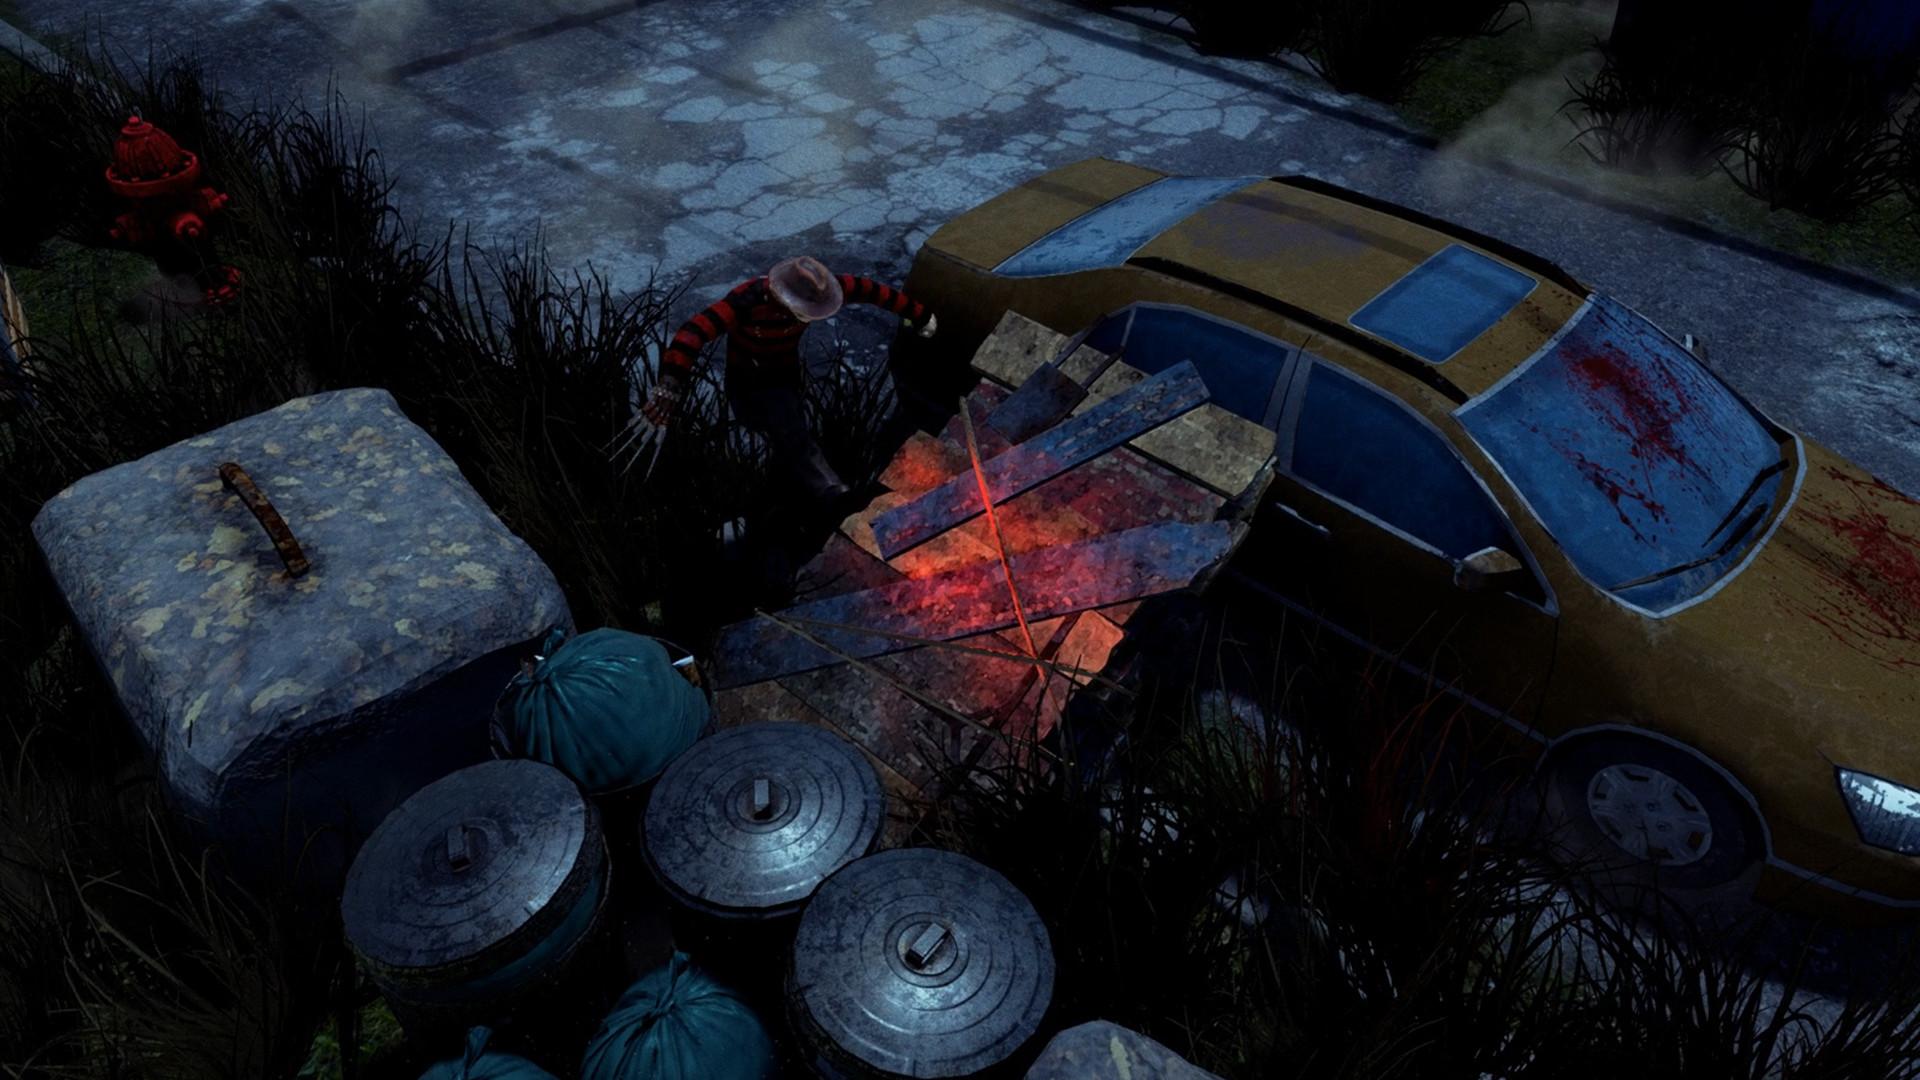 Dead By Daylight A Nightmare On Elm Street On Steam